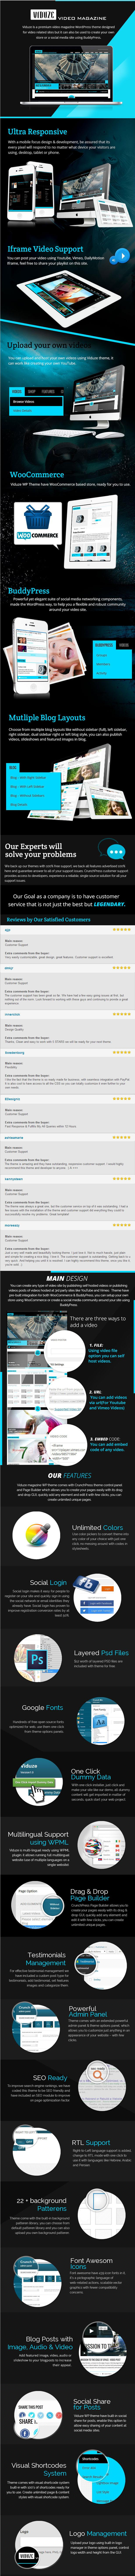 viduze2 - Viduze - Video WordPress Theme